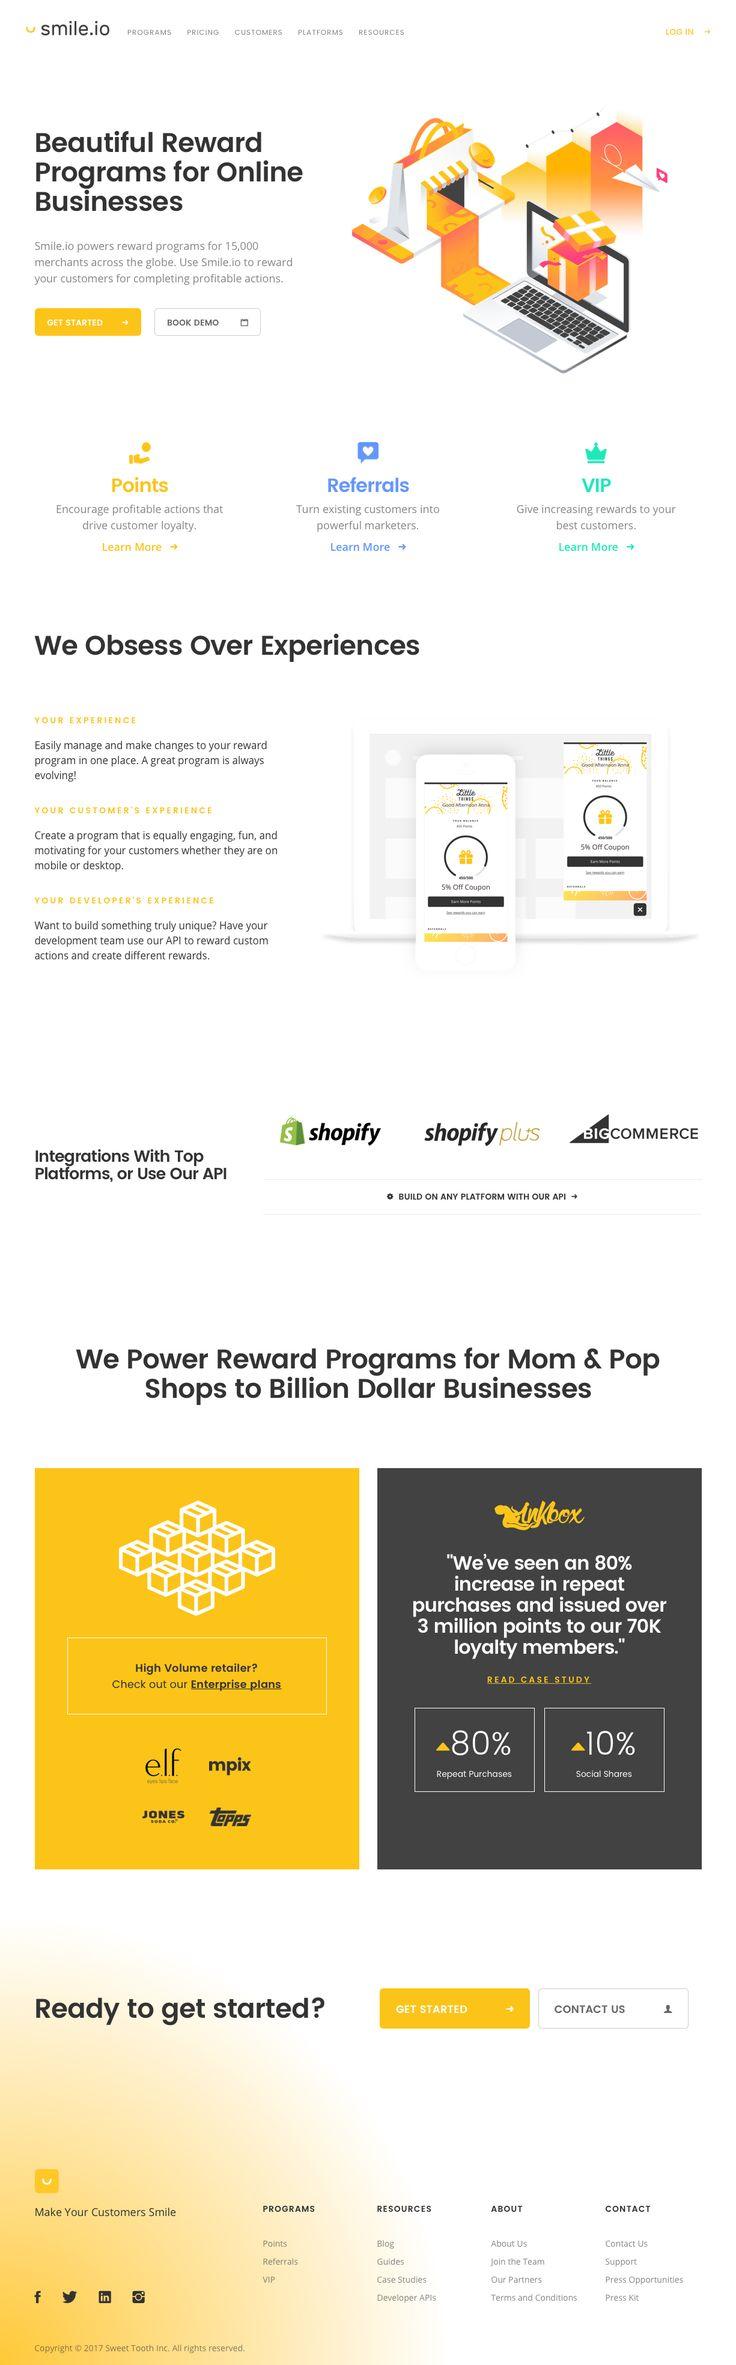 Smile.io - Reward Programs for eCommerce